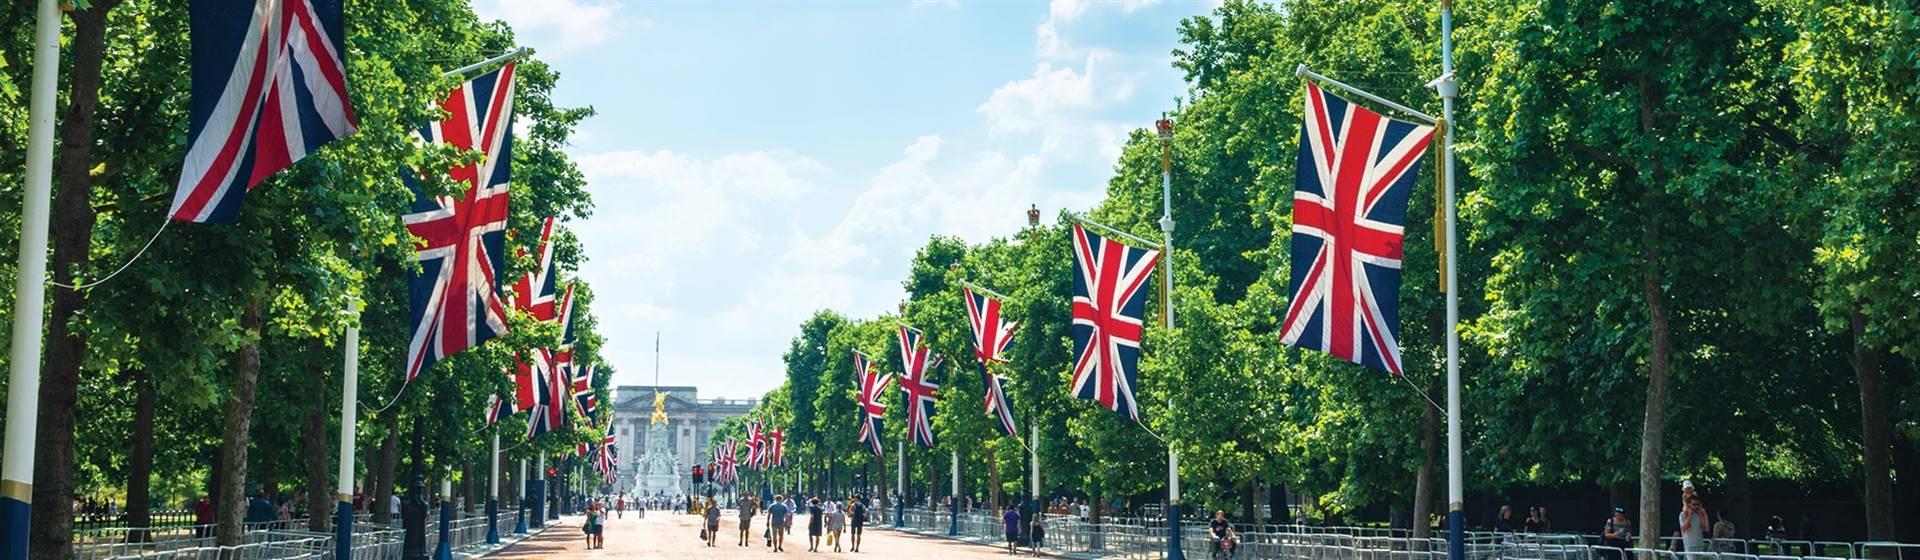 London & Buckingham Palace